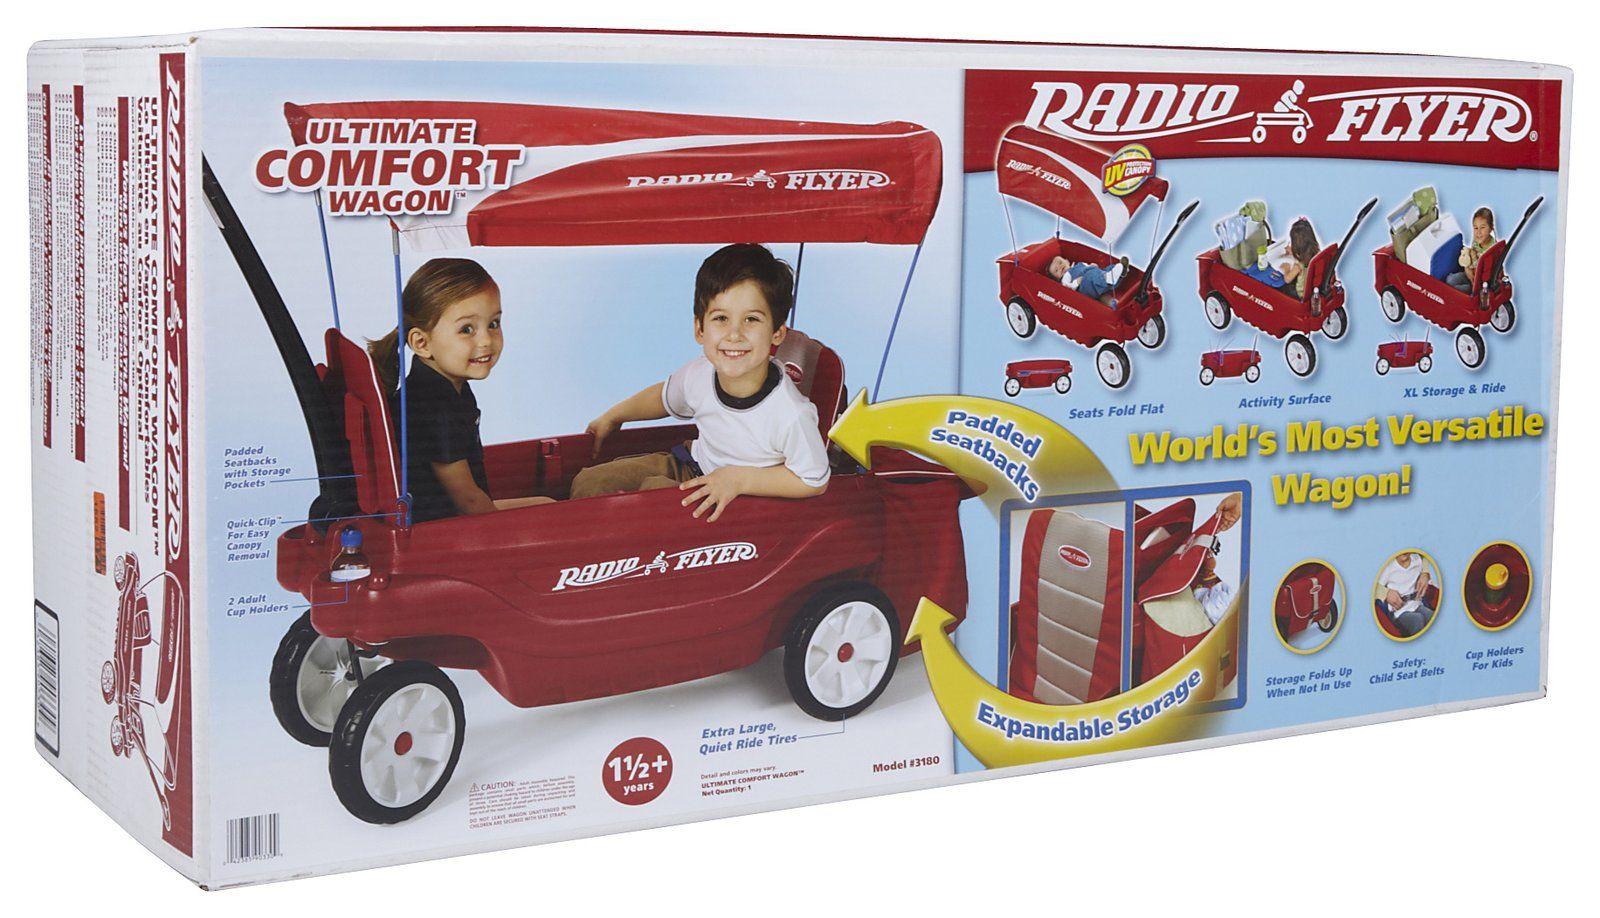 Radio Flyer Ultimate Comfort Wagon Best Price Baby Accesories Radio Flyer Baby Accessories